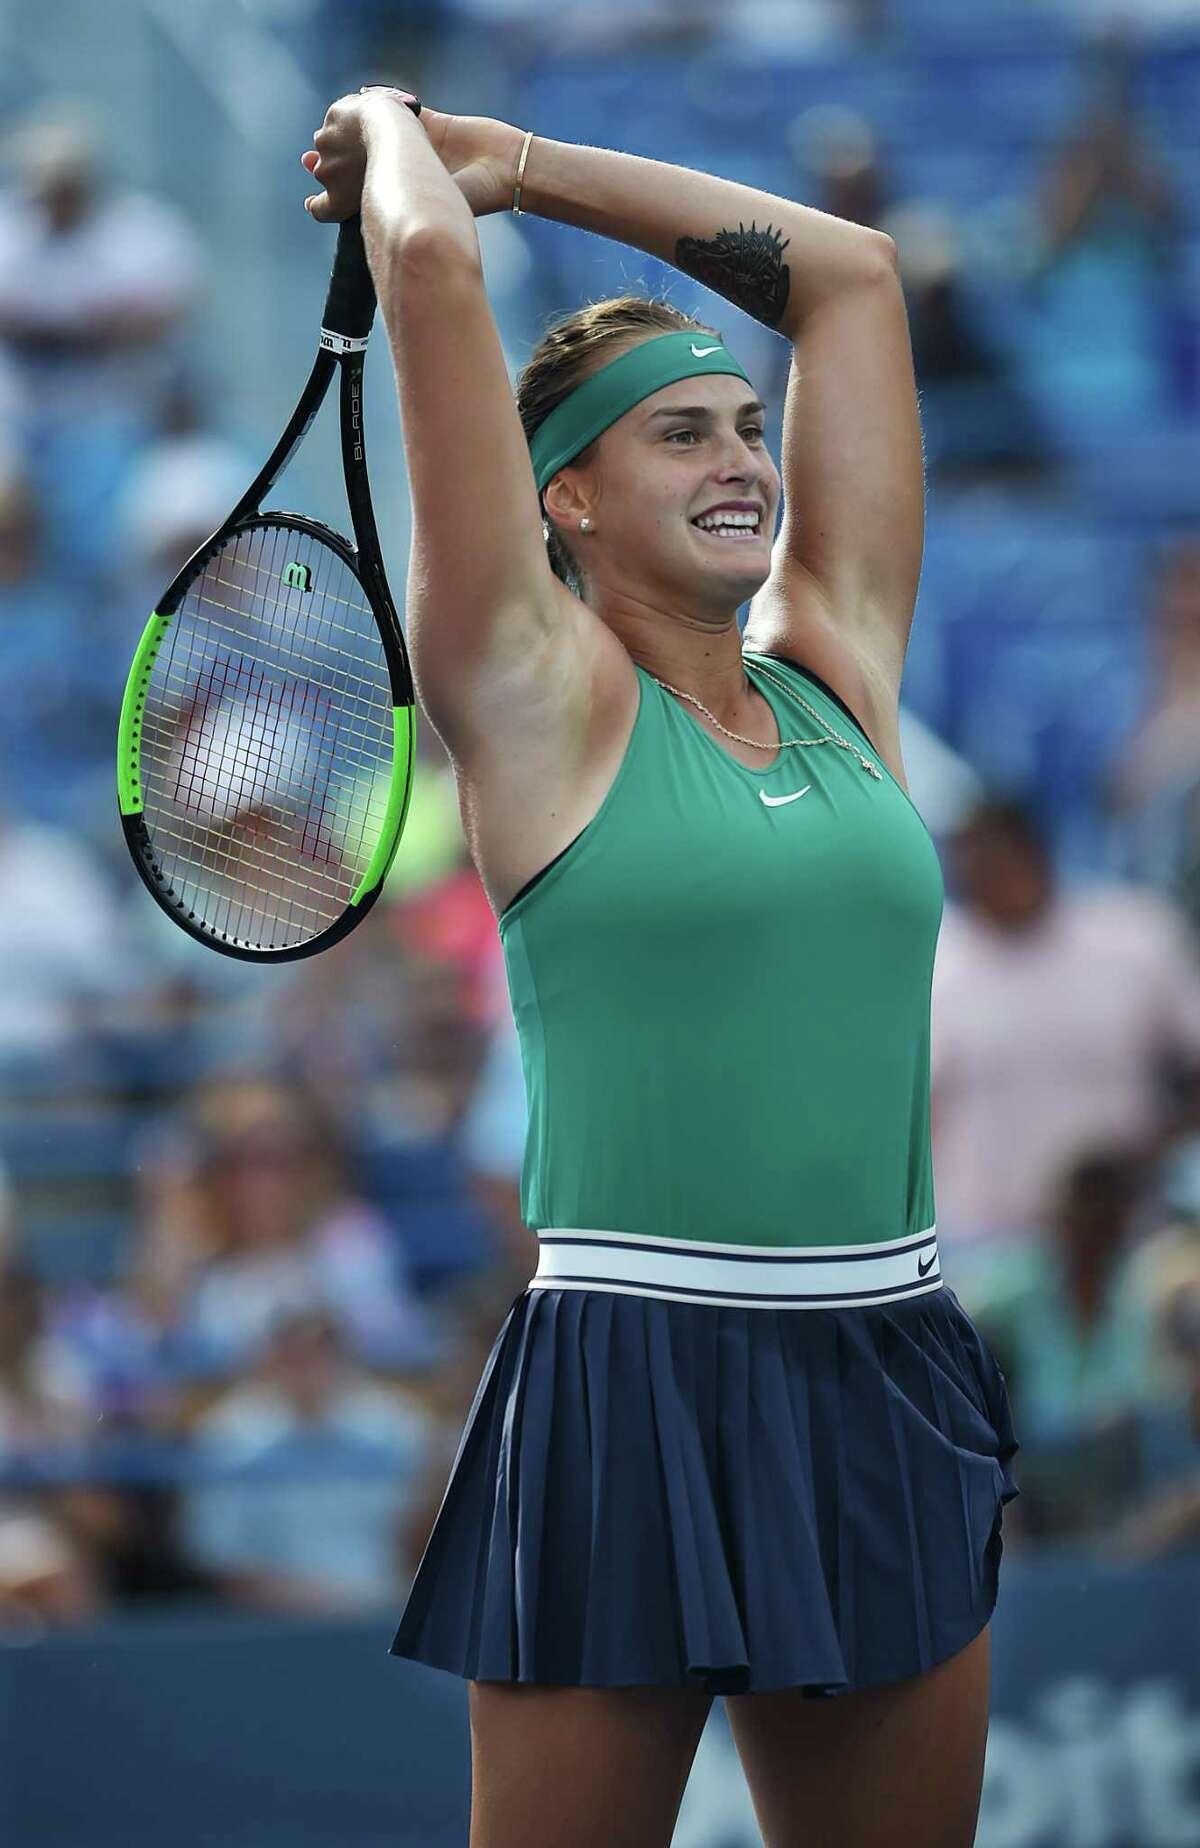 Aryna Sabalenka celebrates her win over Carla Suarez Navarro in the Connecticut Open final on Saturday.